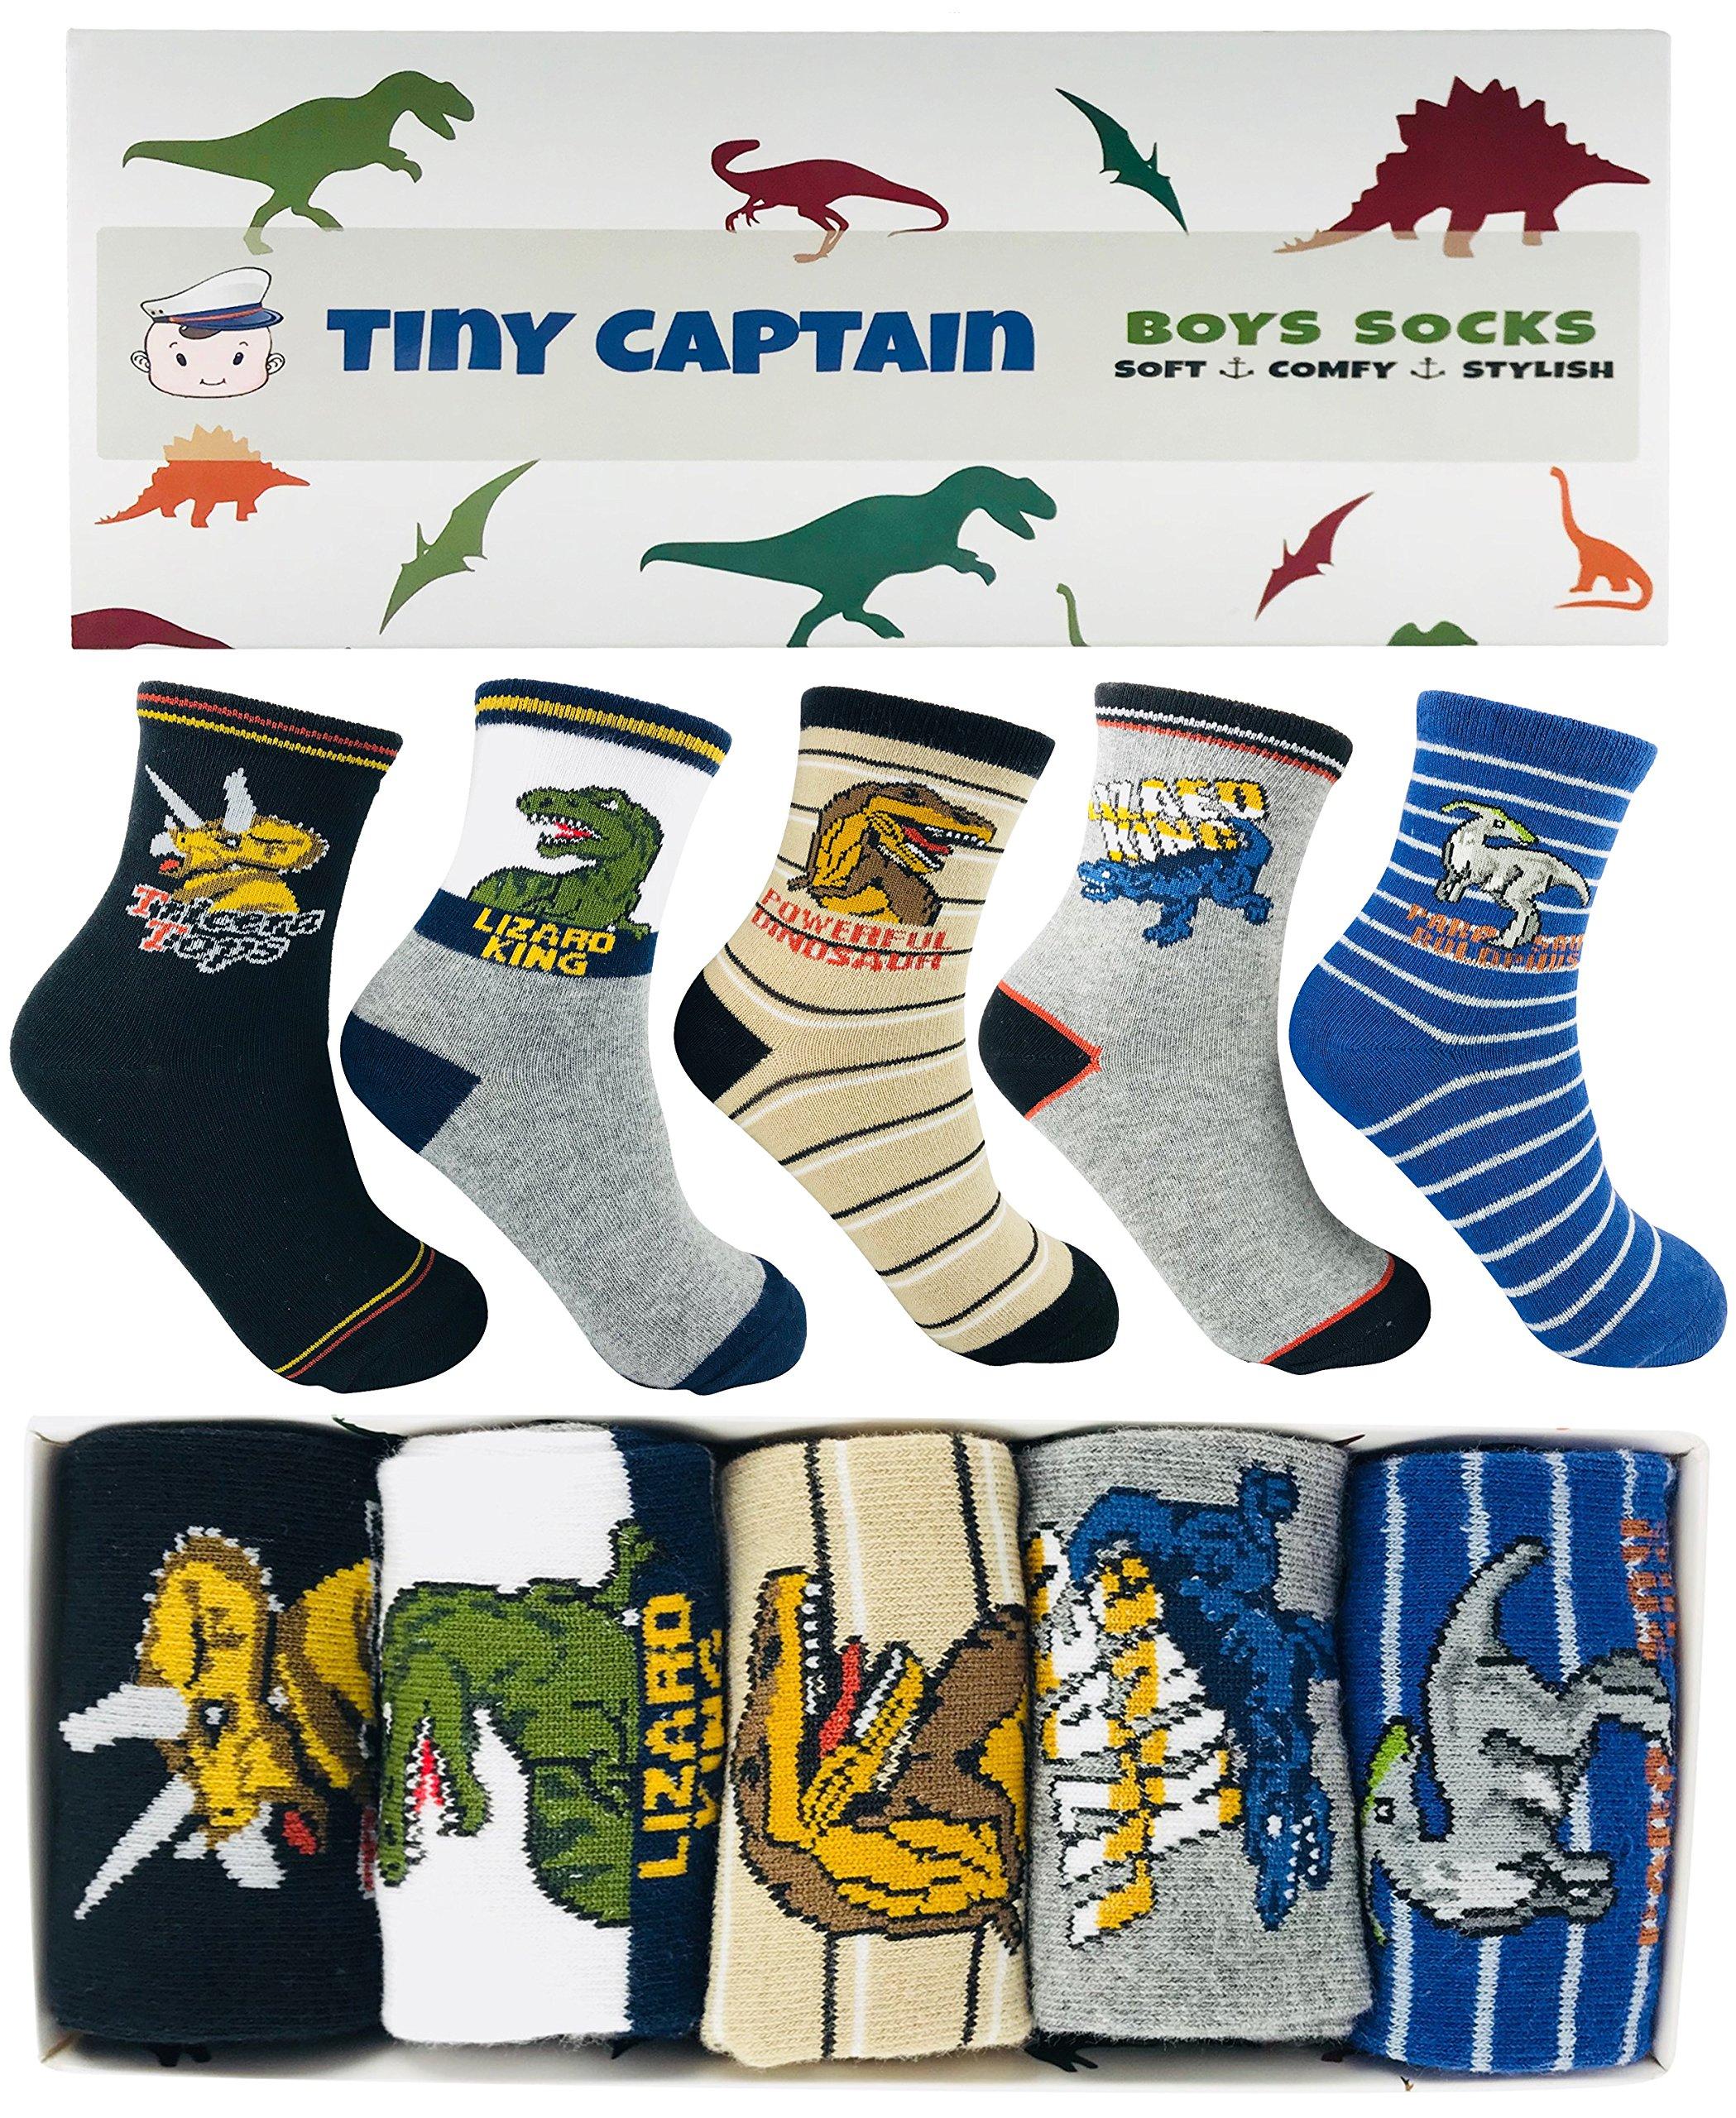 Tiny Captain Boy Dinosaur Socks 4-7 Year Old Boys Crew Cotton Sock Perfect Age 5 Gift Set (Medium, Green)